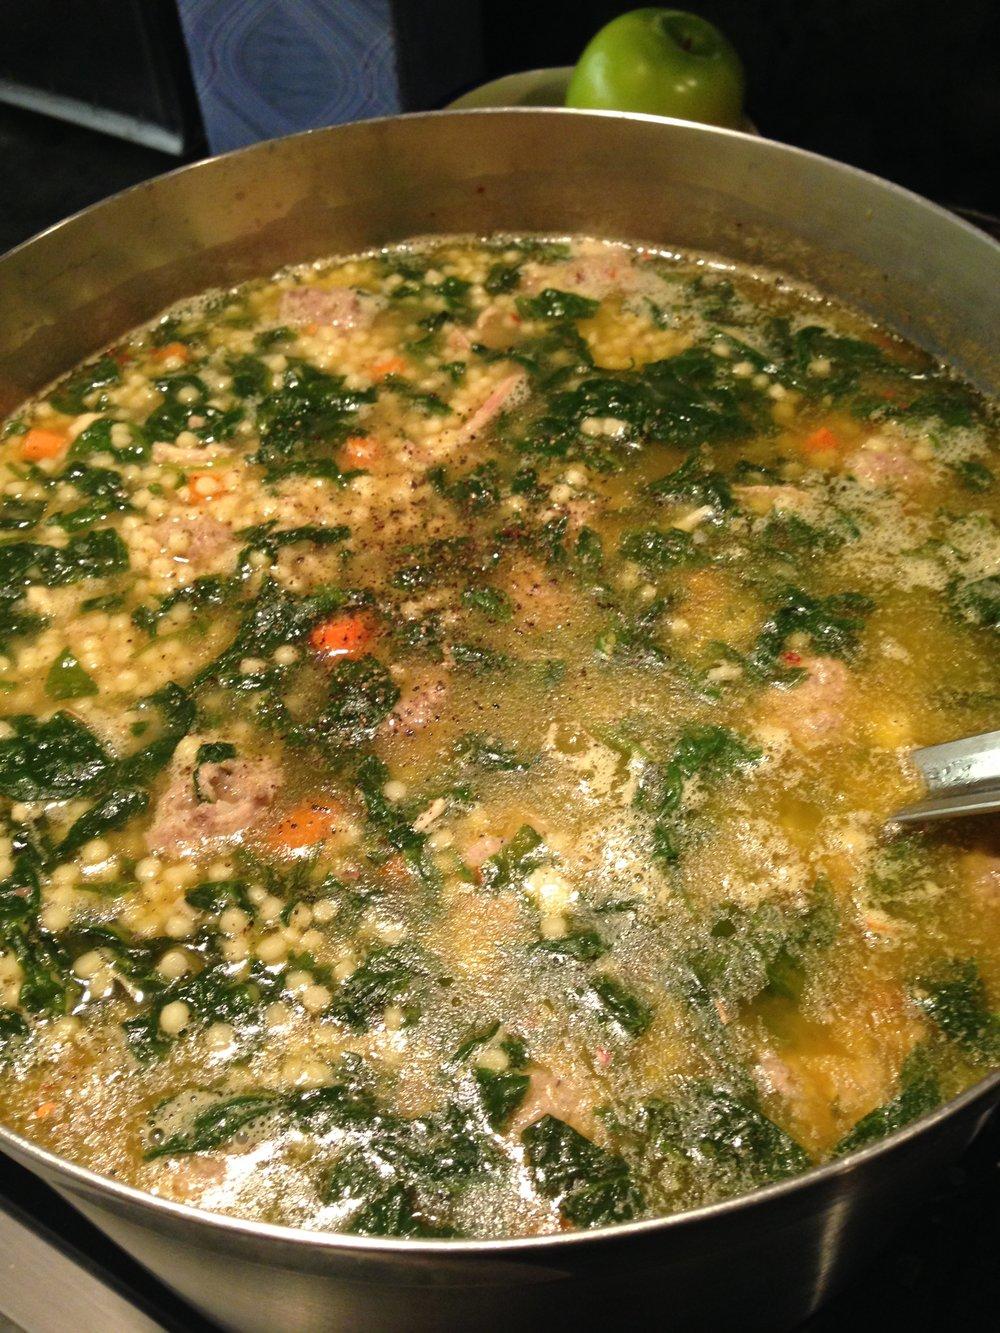 Chris' Italian Wedding Soup